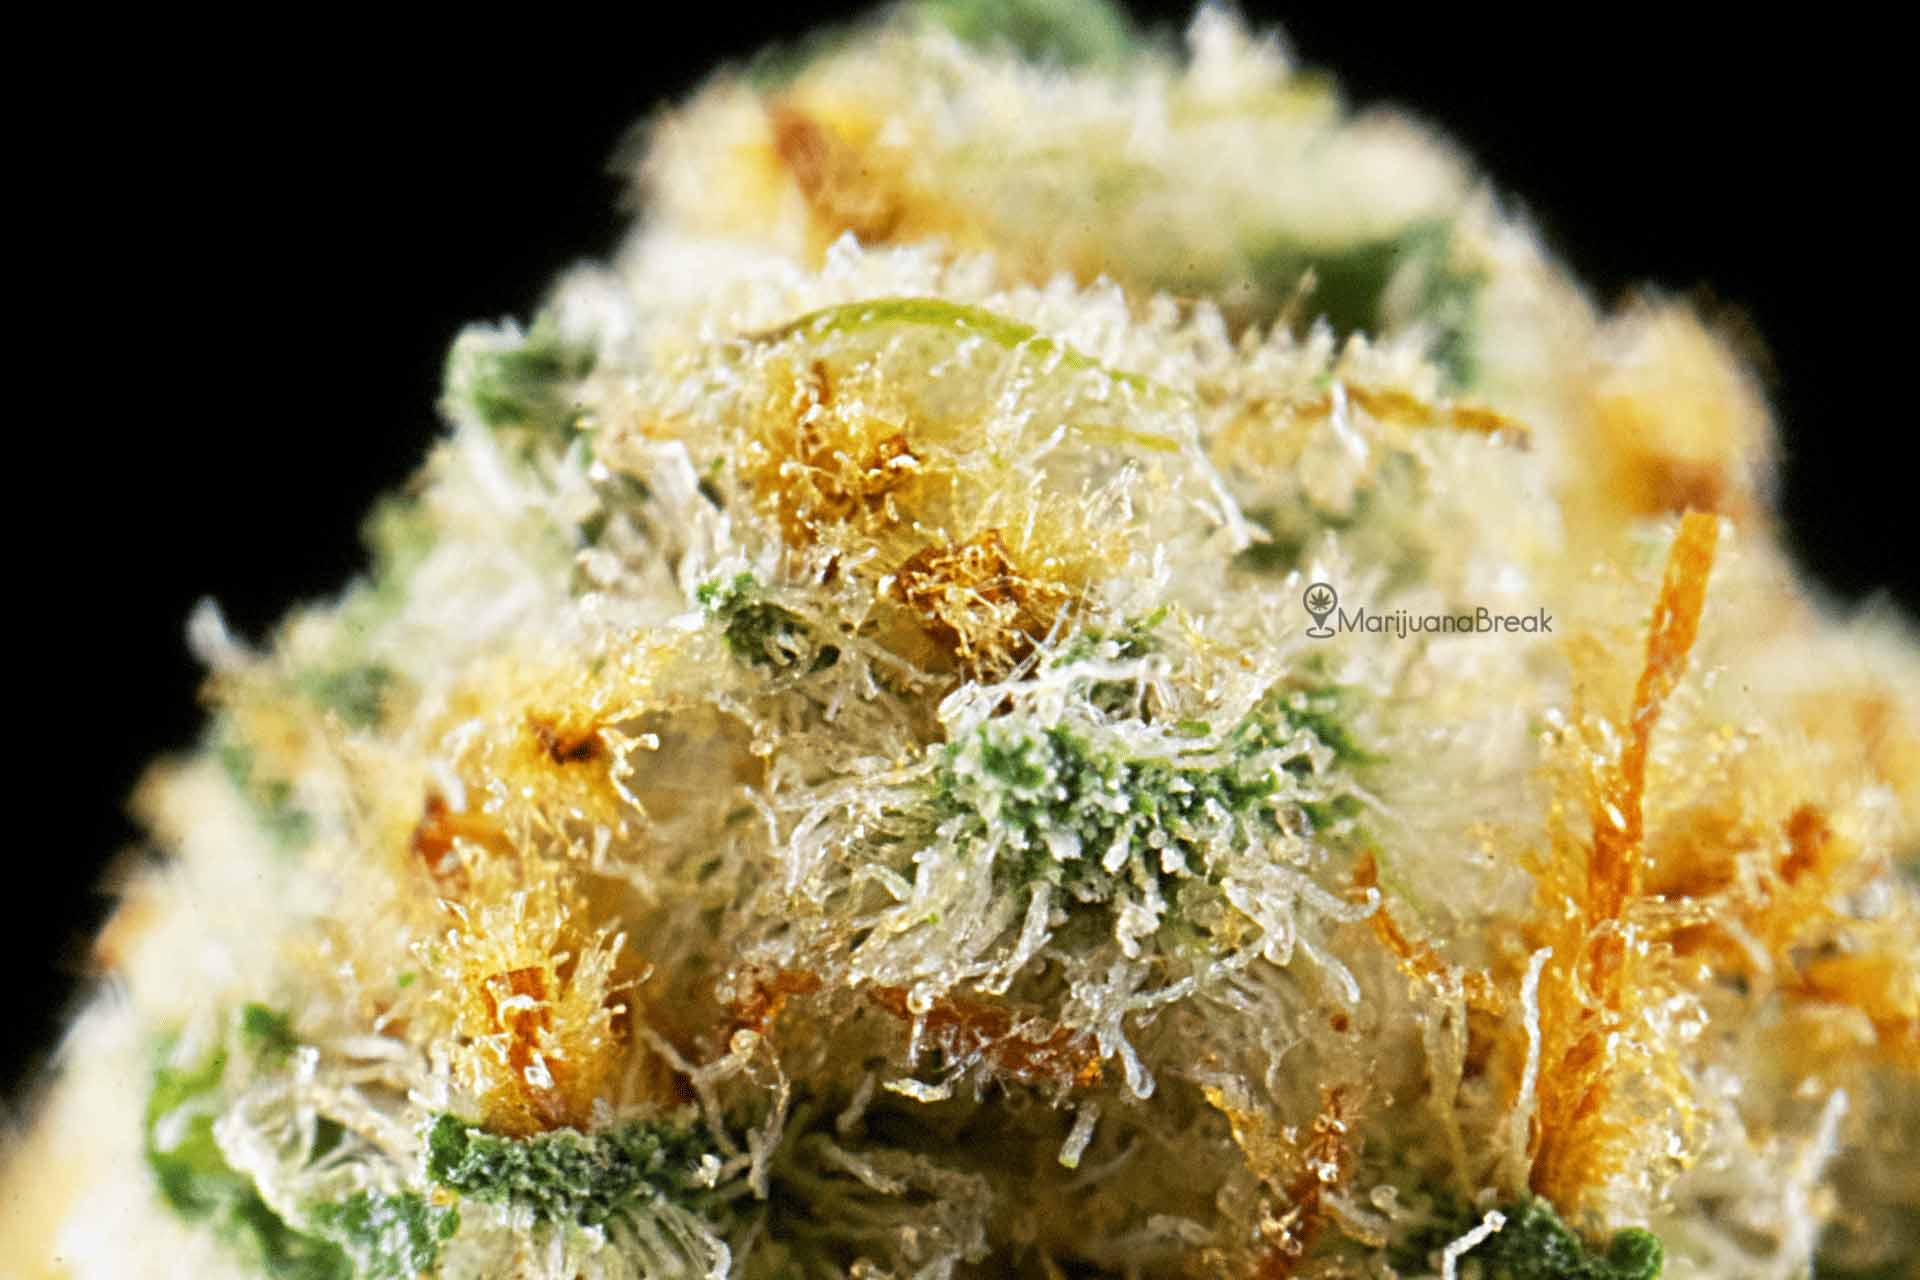 cannatonic macro marijuana